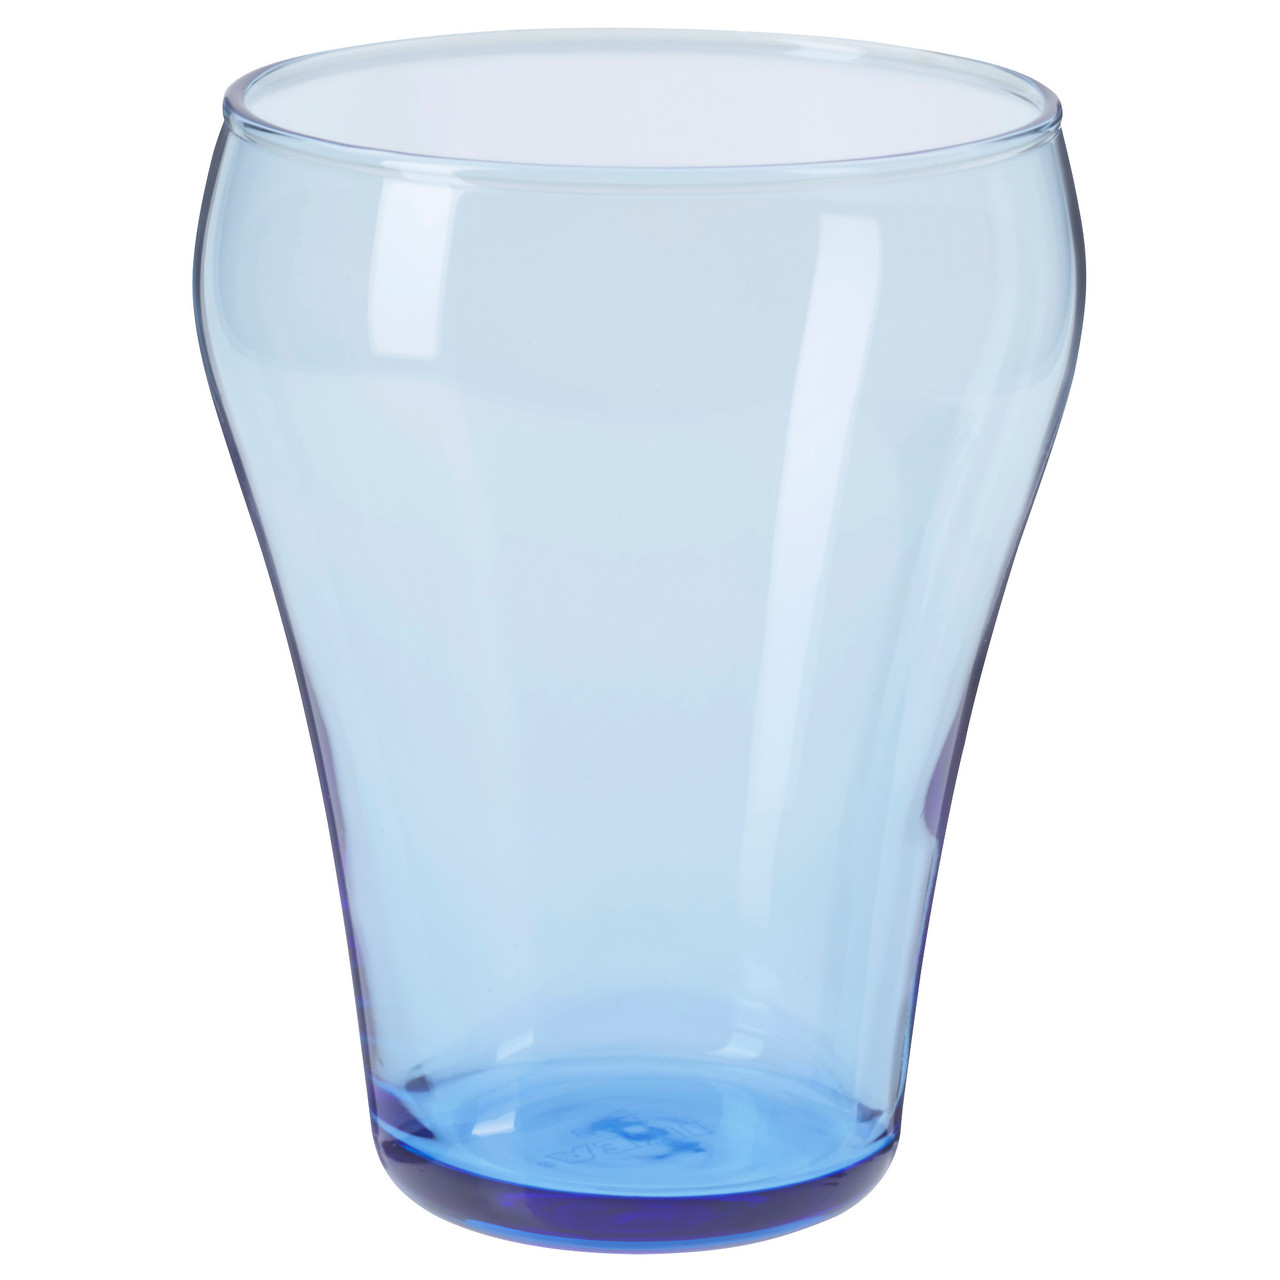 "ИКЕА ""ТОРСТИГ"" Стакан, синий 6шт./310мл."